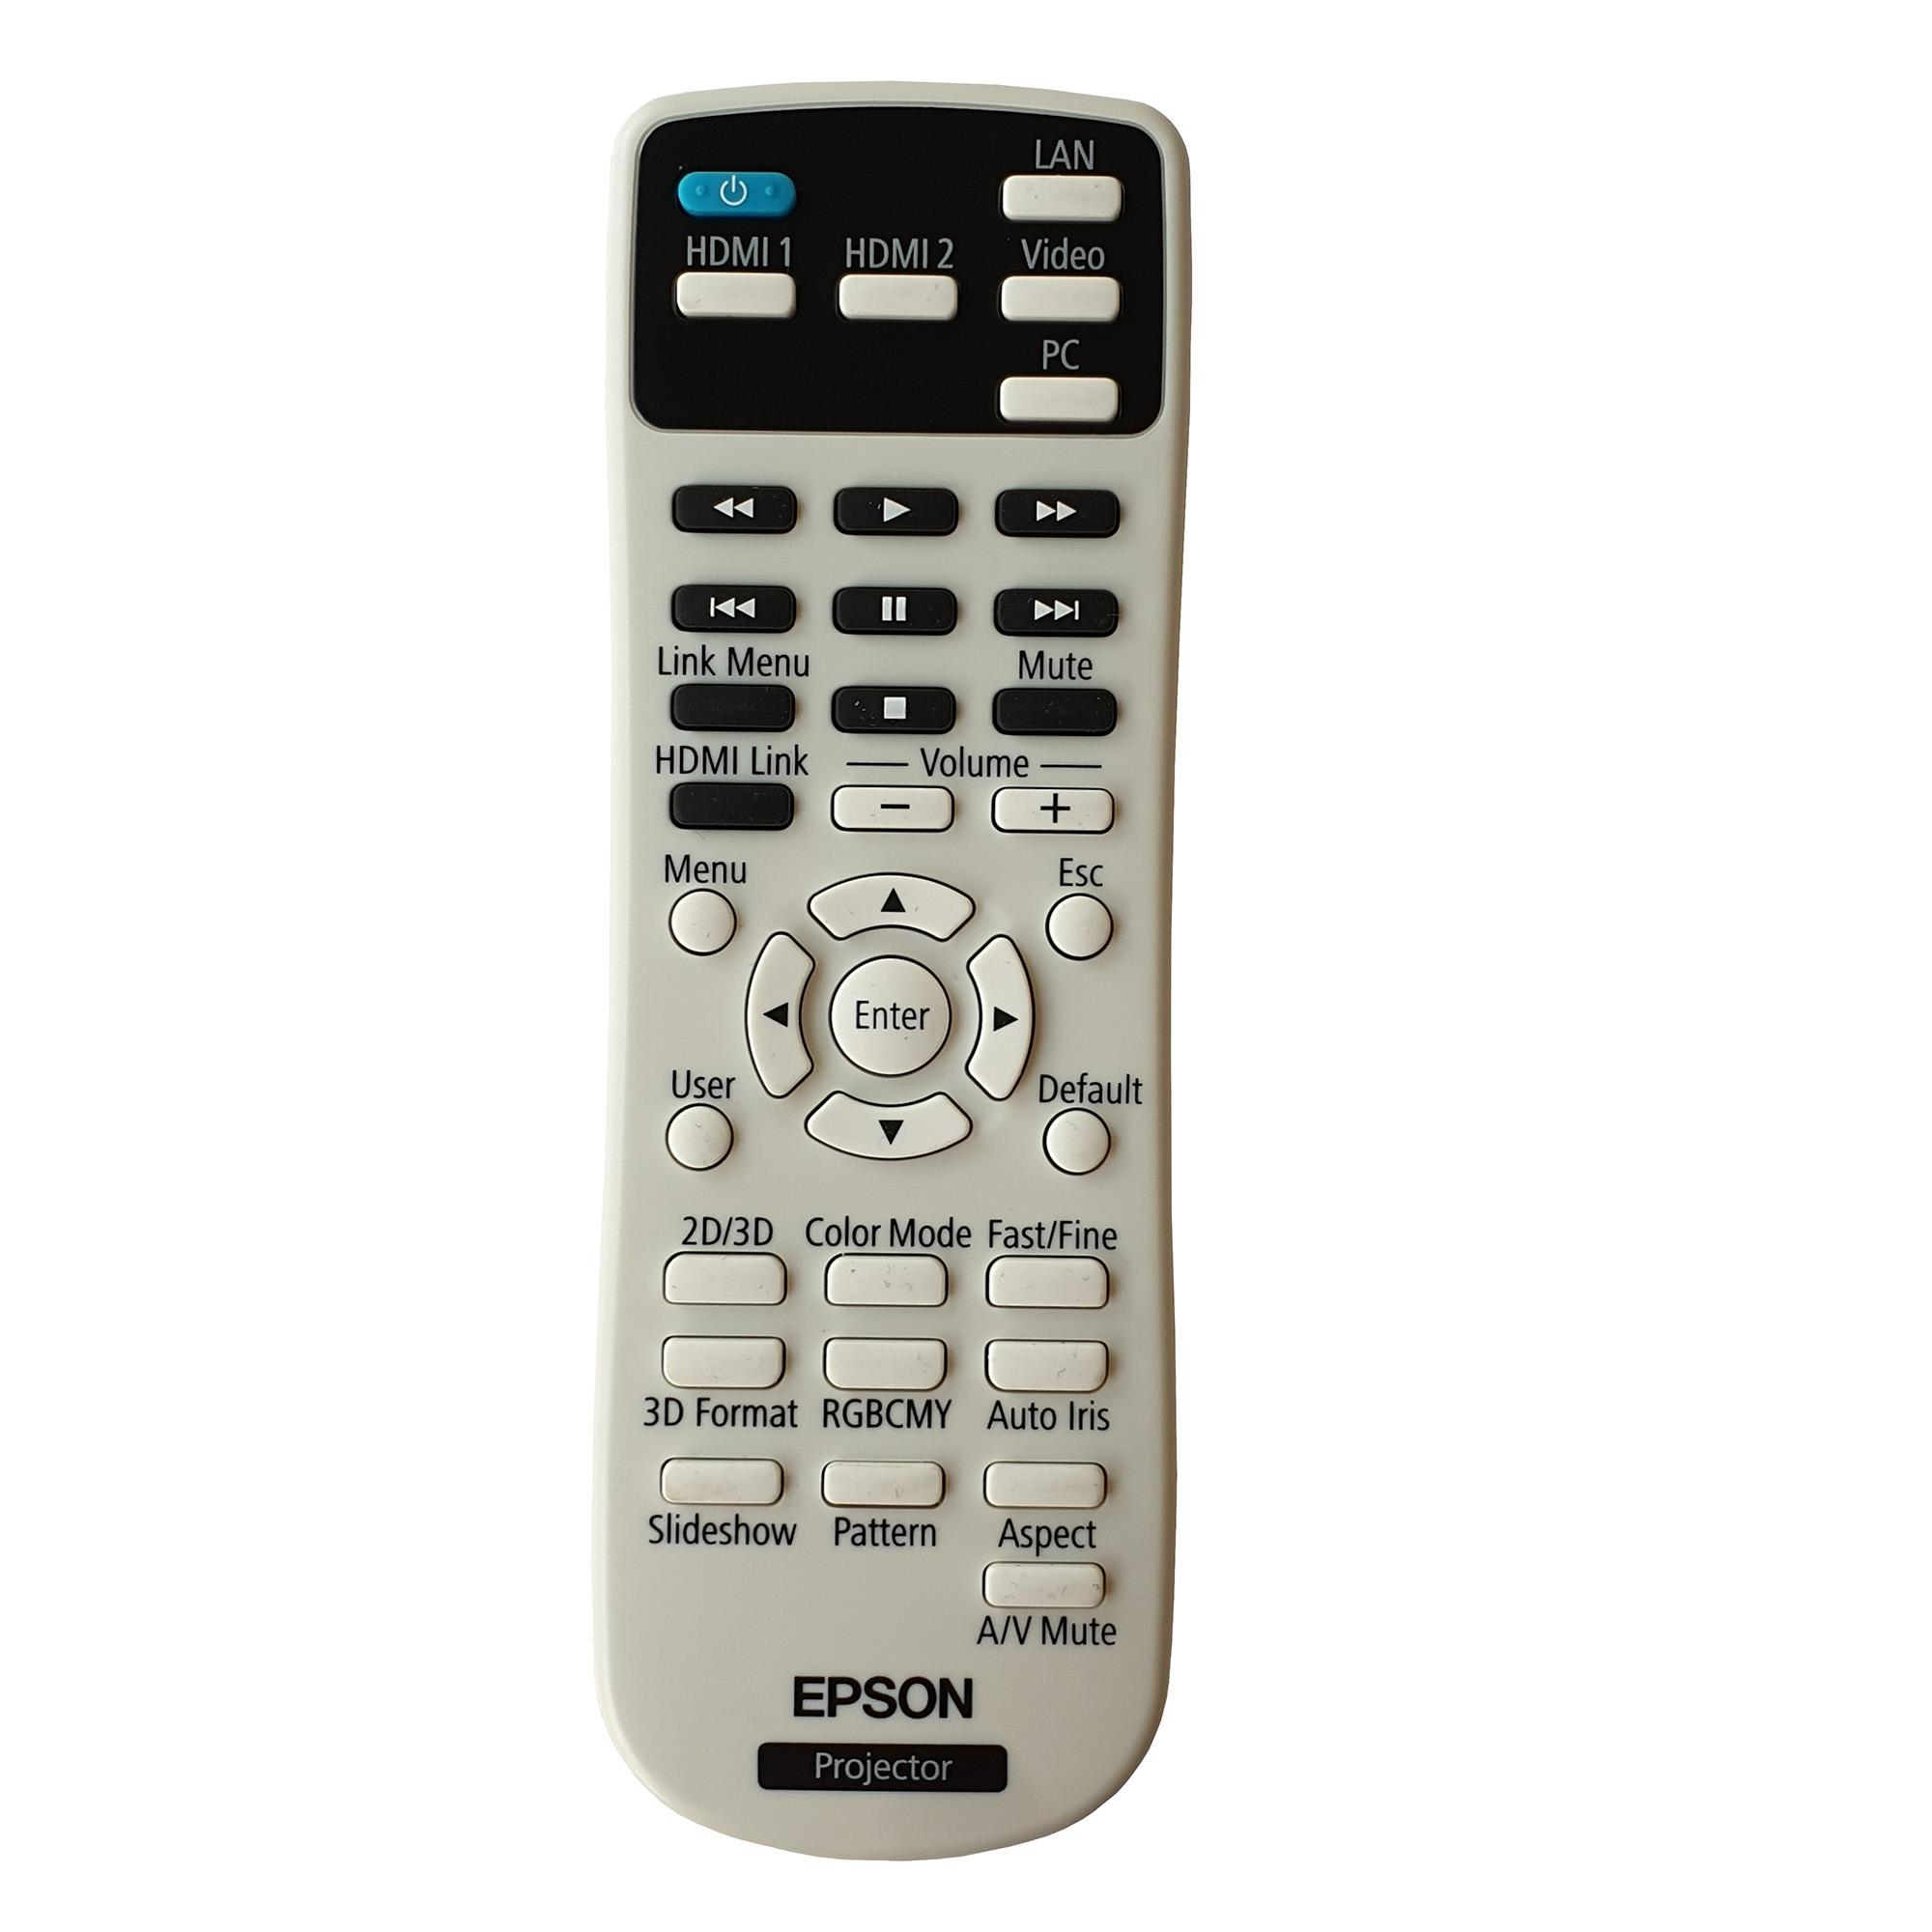 قیمت                      کنترل پروژکتور اپسون مدل 16028